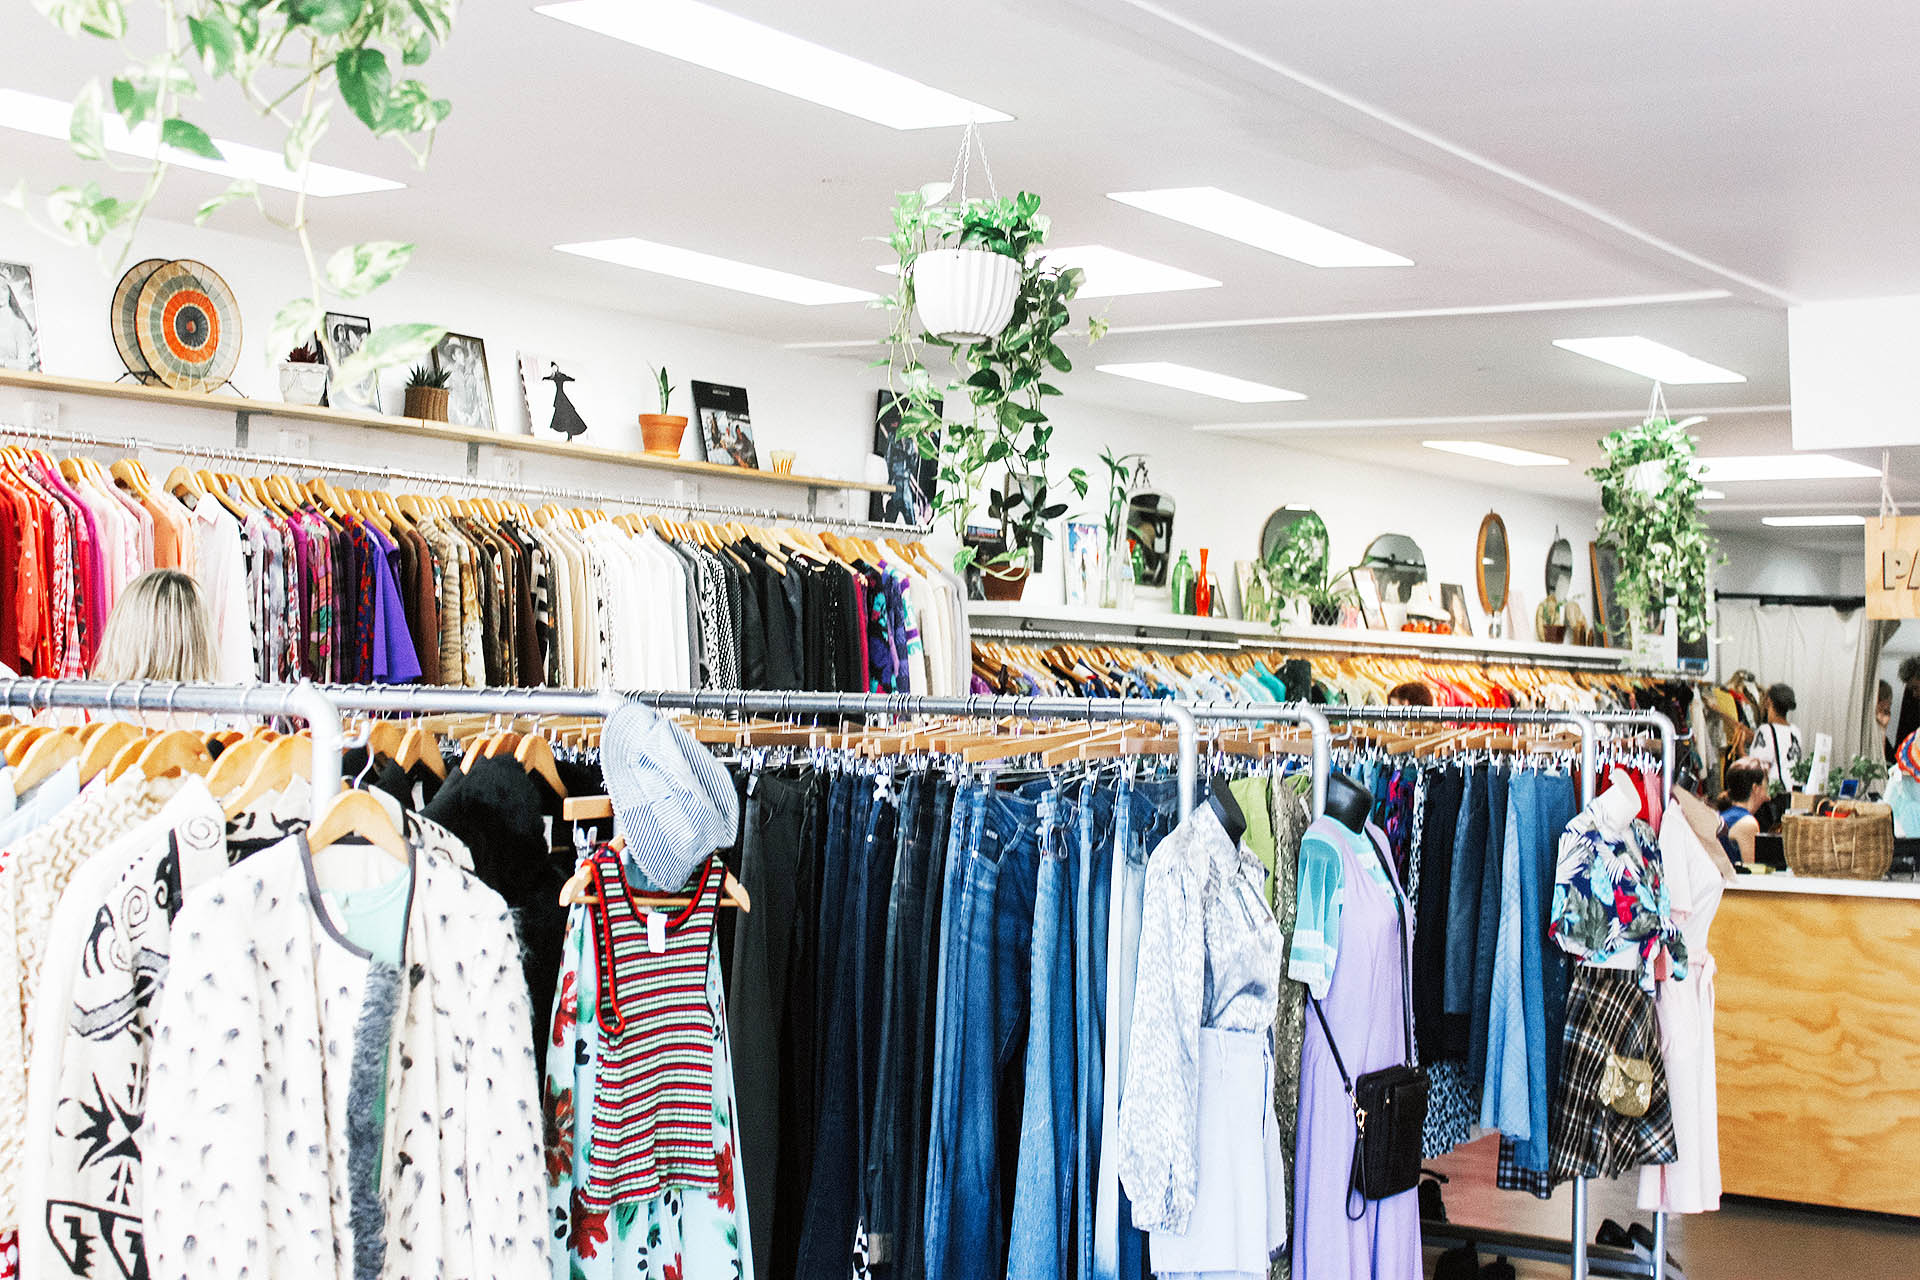 Shop - Stress free shopping